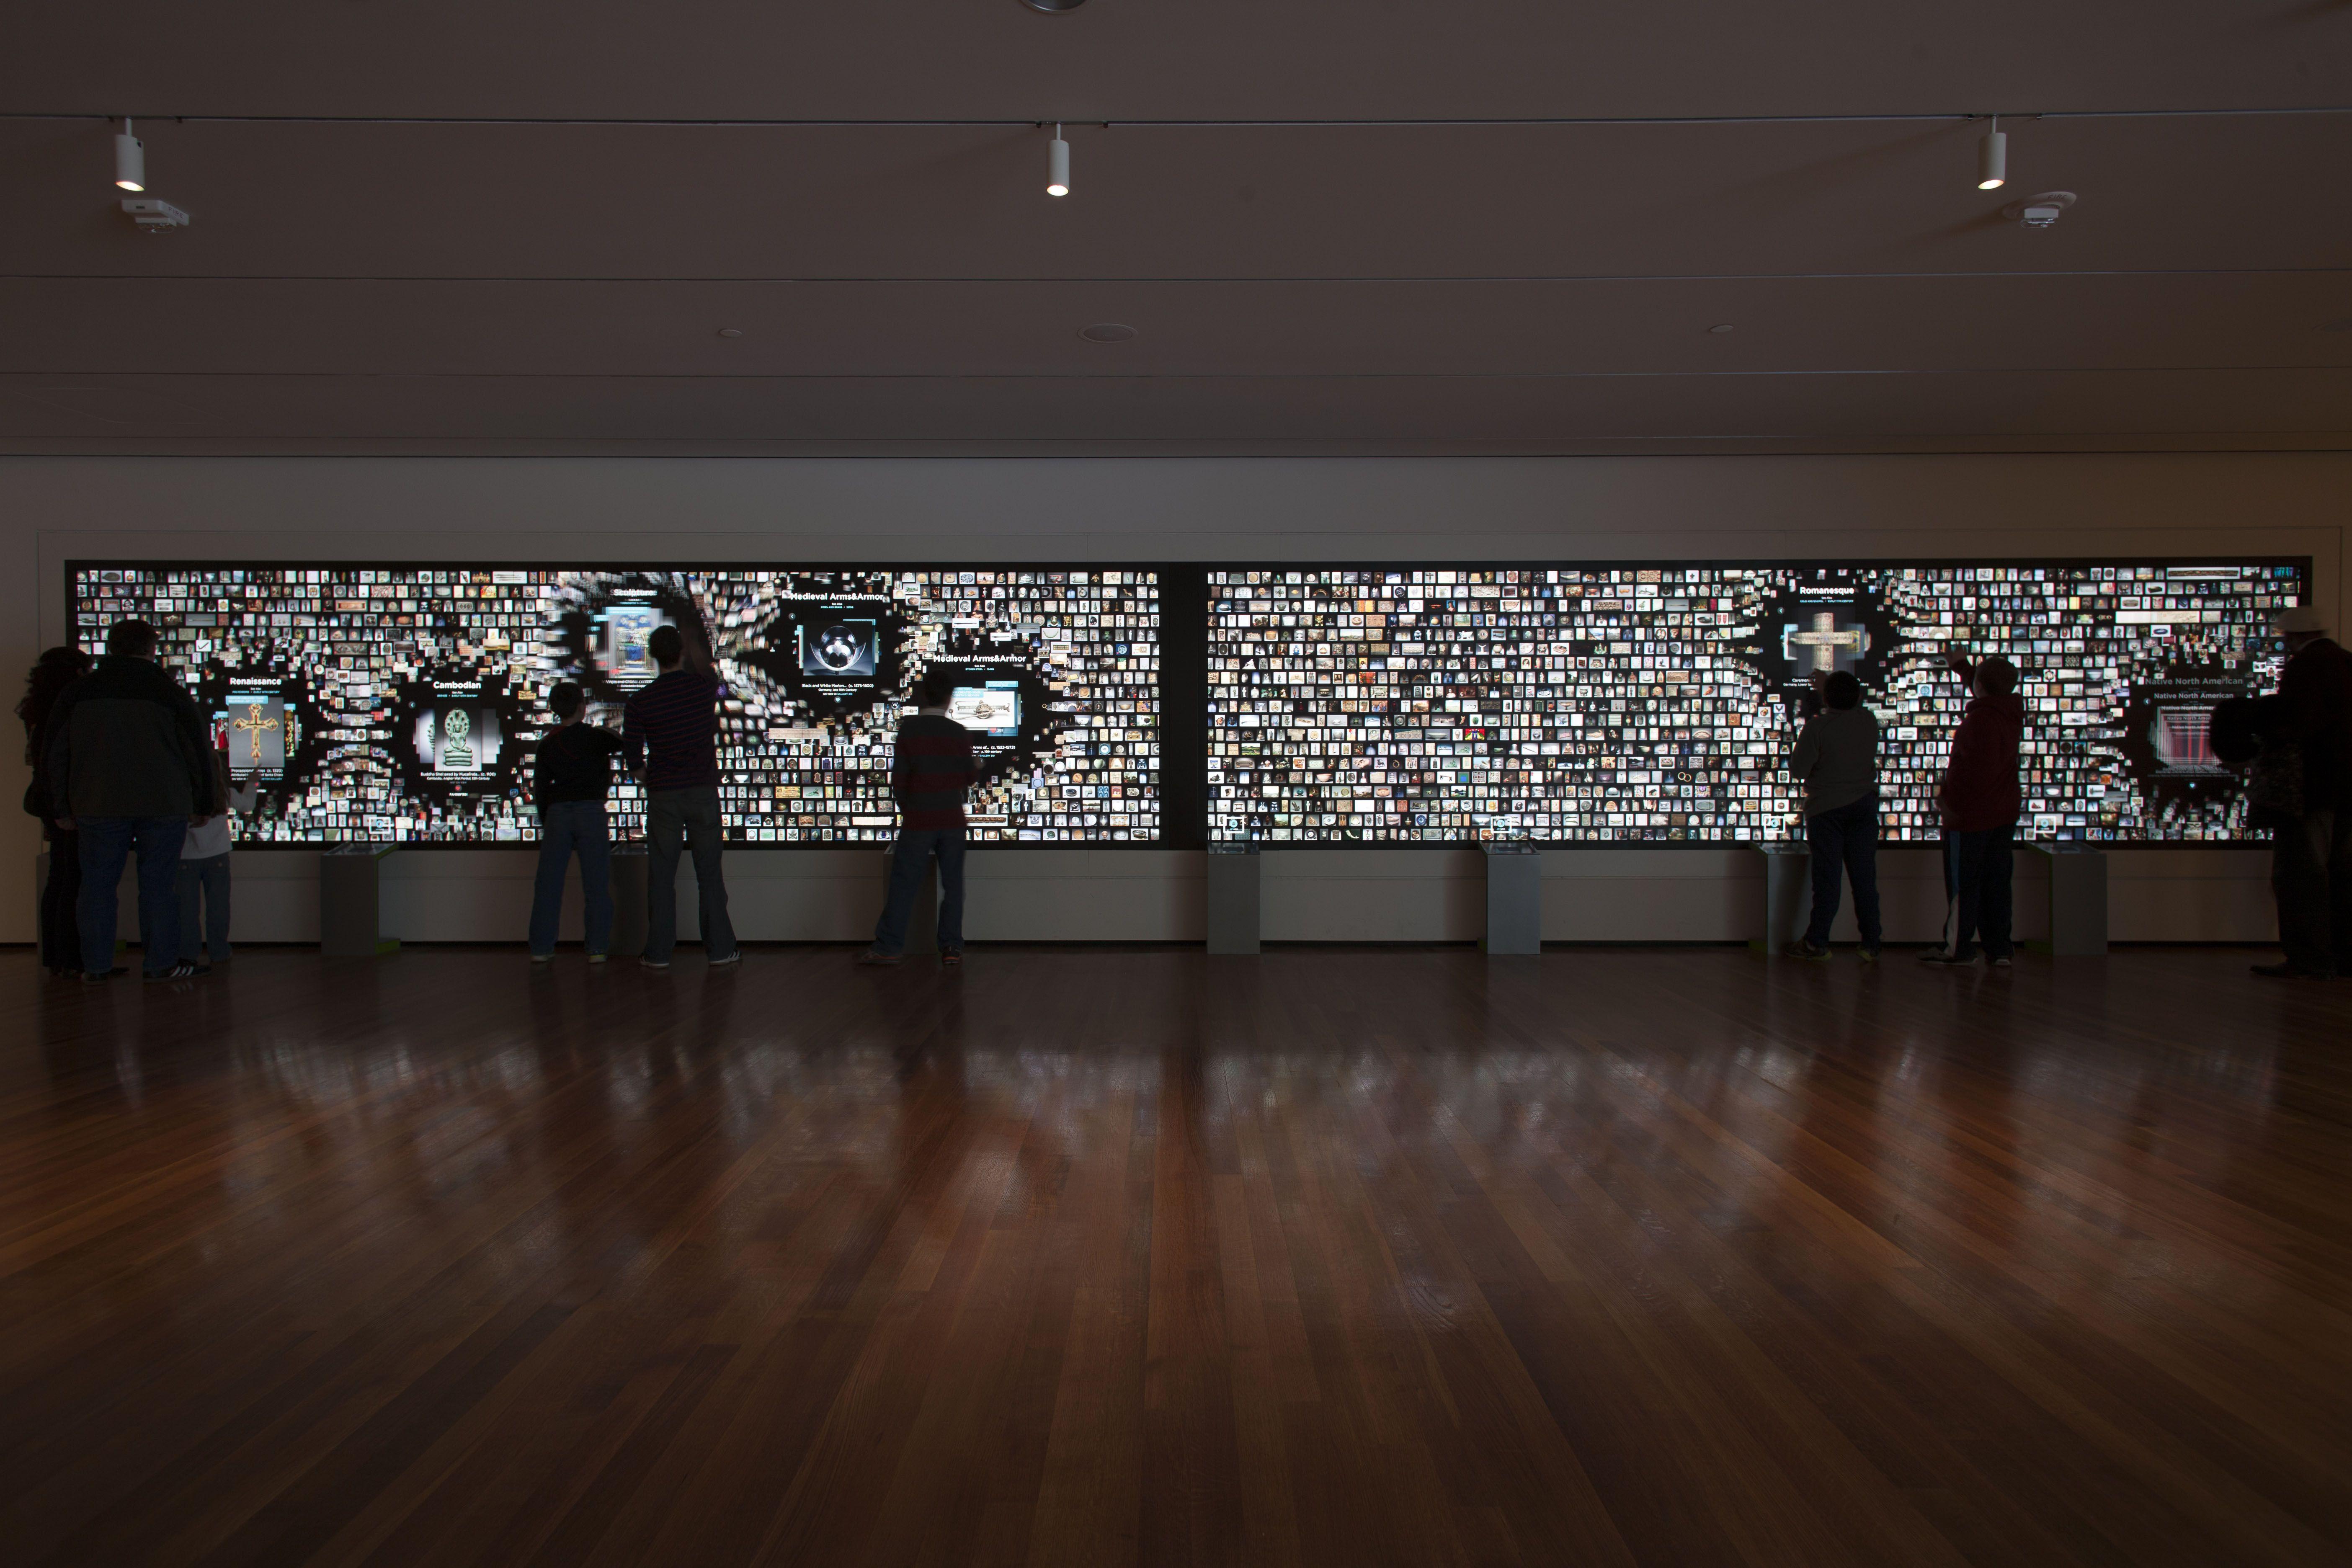 Interactive Art Wall Artwork Experience